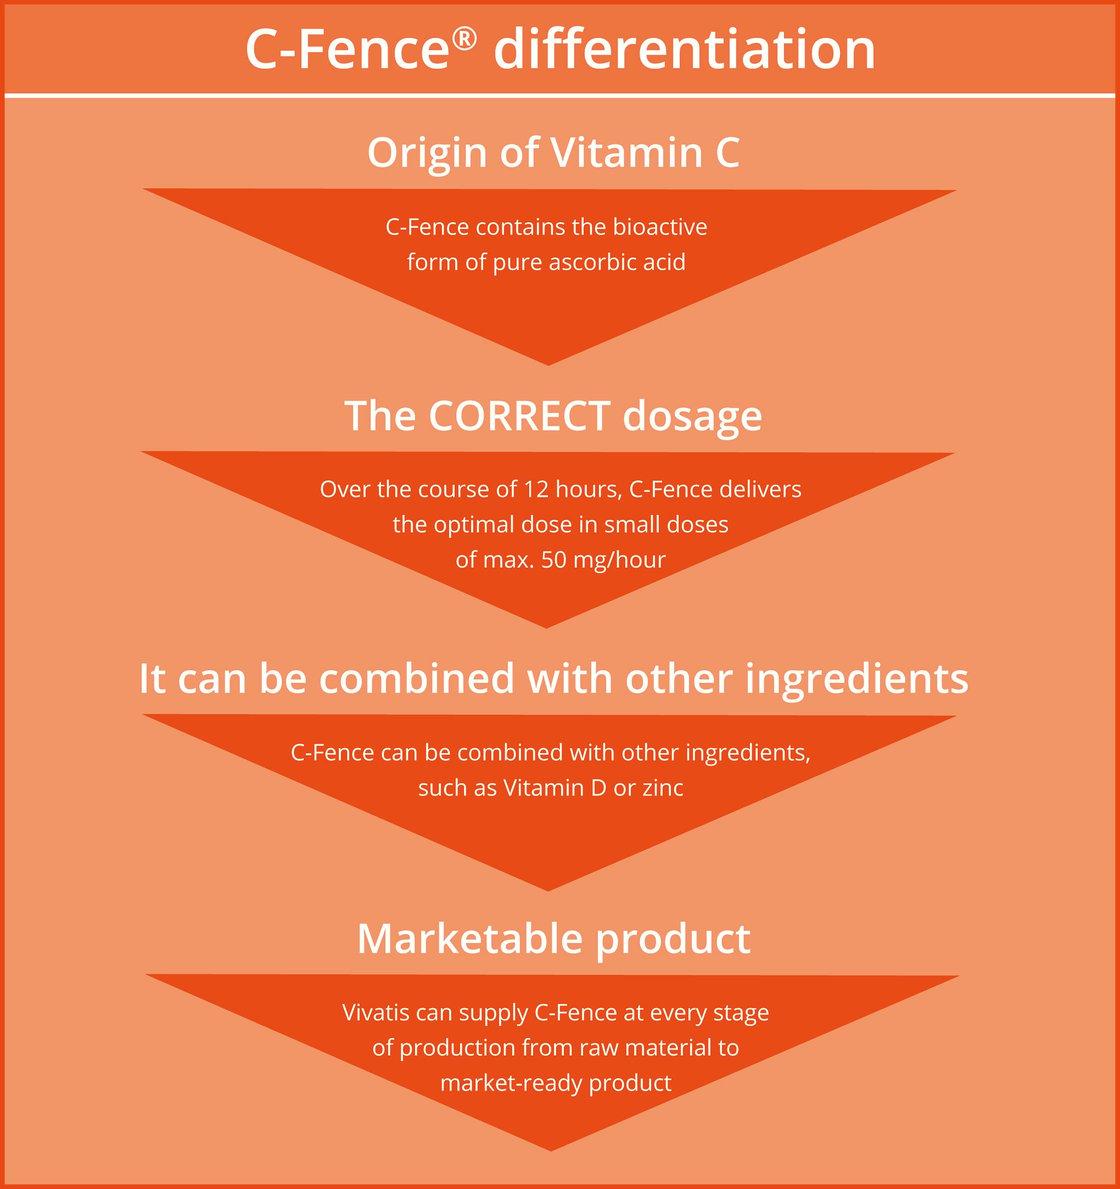 C-Fence_differentiation_EN